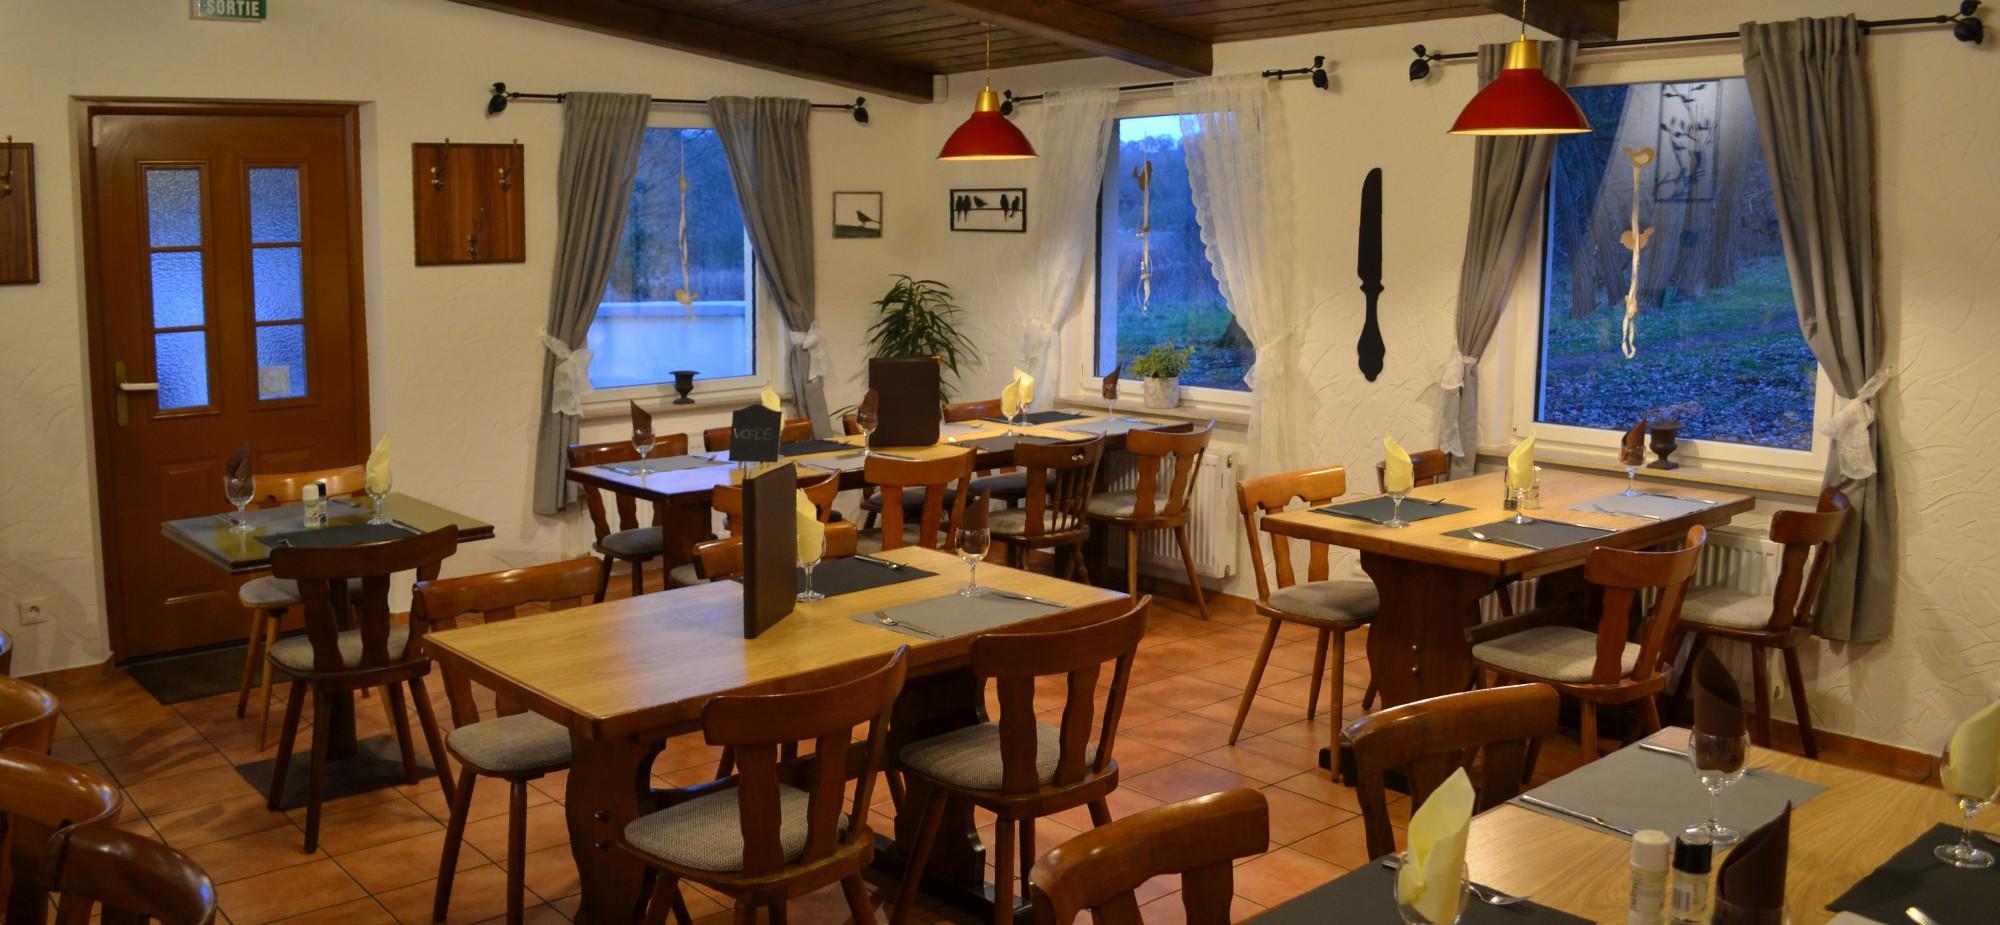 Restaurant-Schmuggelbud-Überherrn-Gesellschaft-Feier